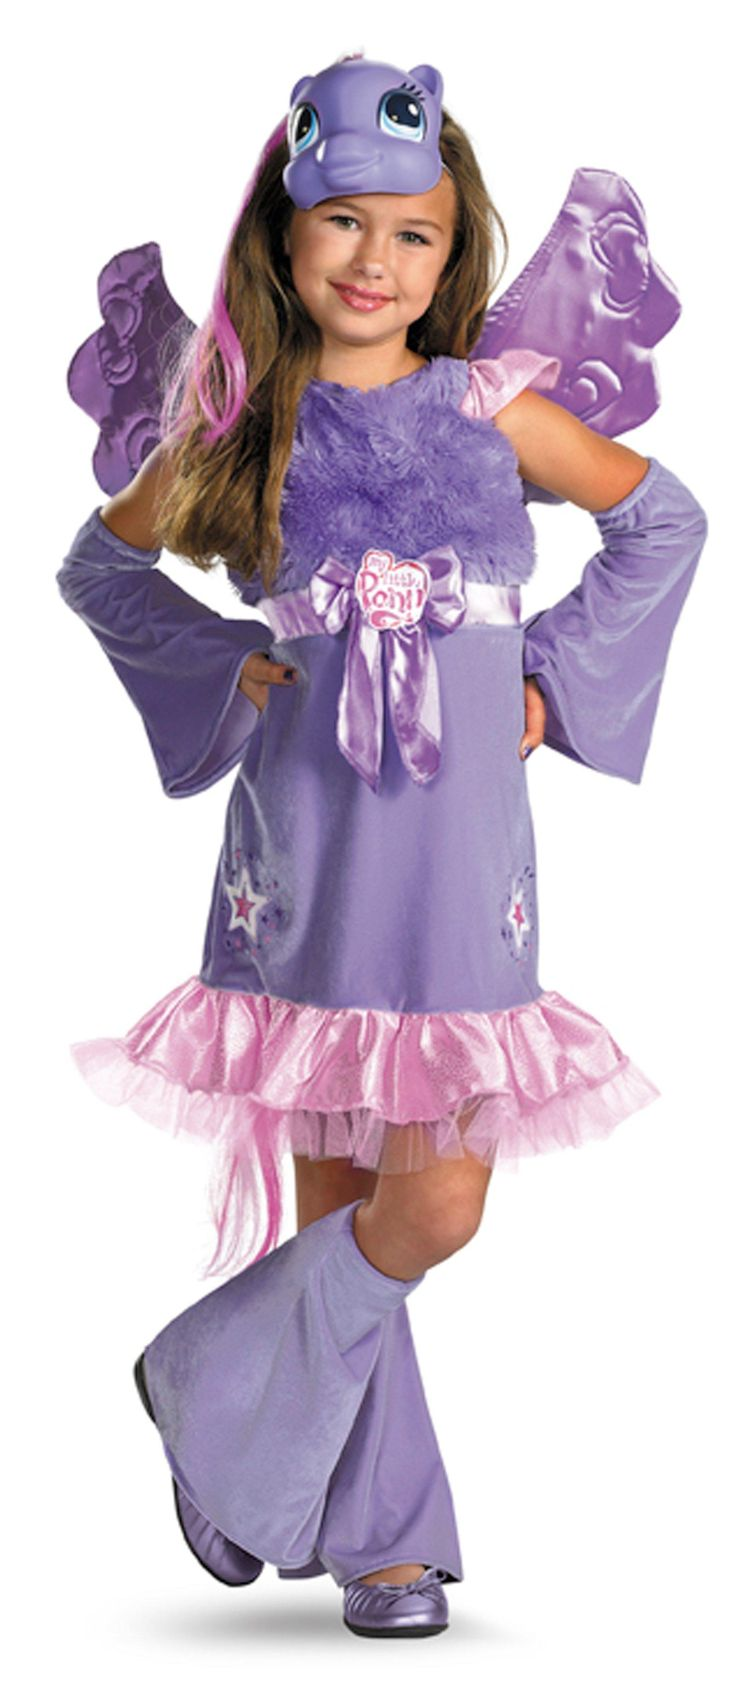 Best 20+ Toddler costumes ideas on Pinterest | Toddler halloween ...